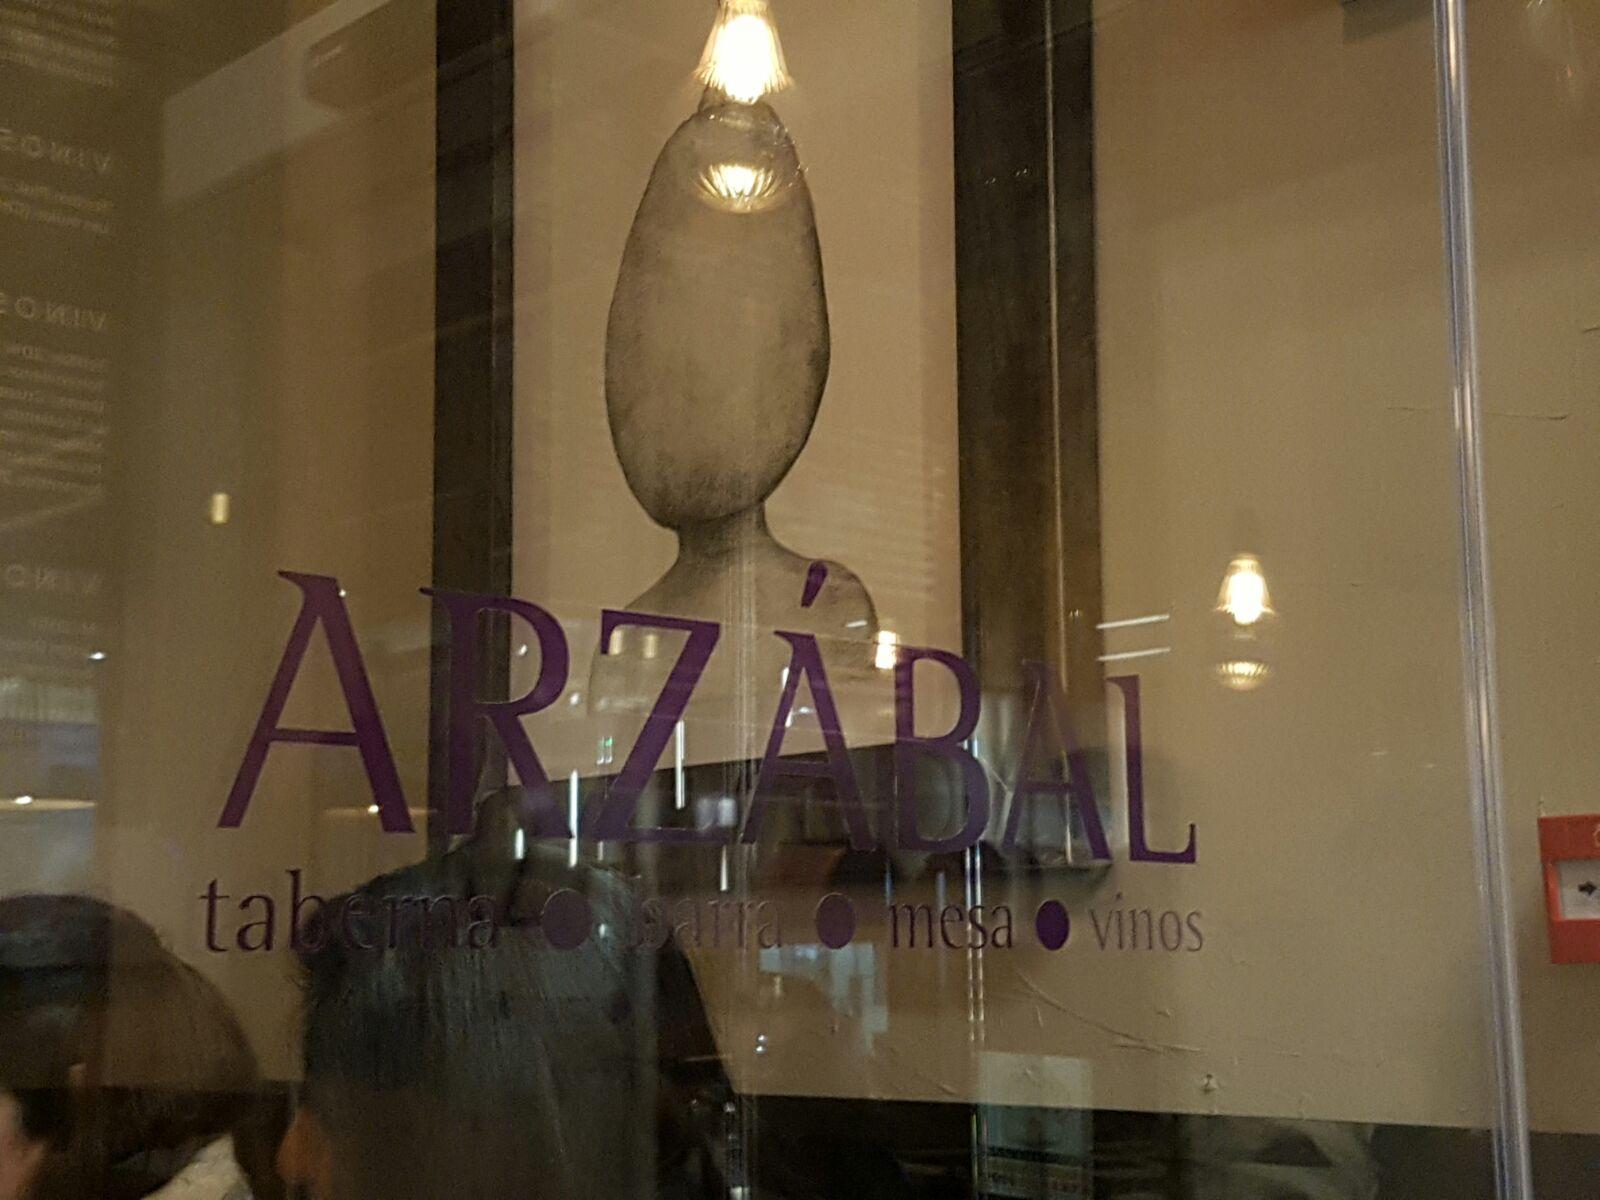 Taberna arzabal buen tapeo en ponzano madrid ideal tapeo - Zona chamberi madrid ...